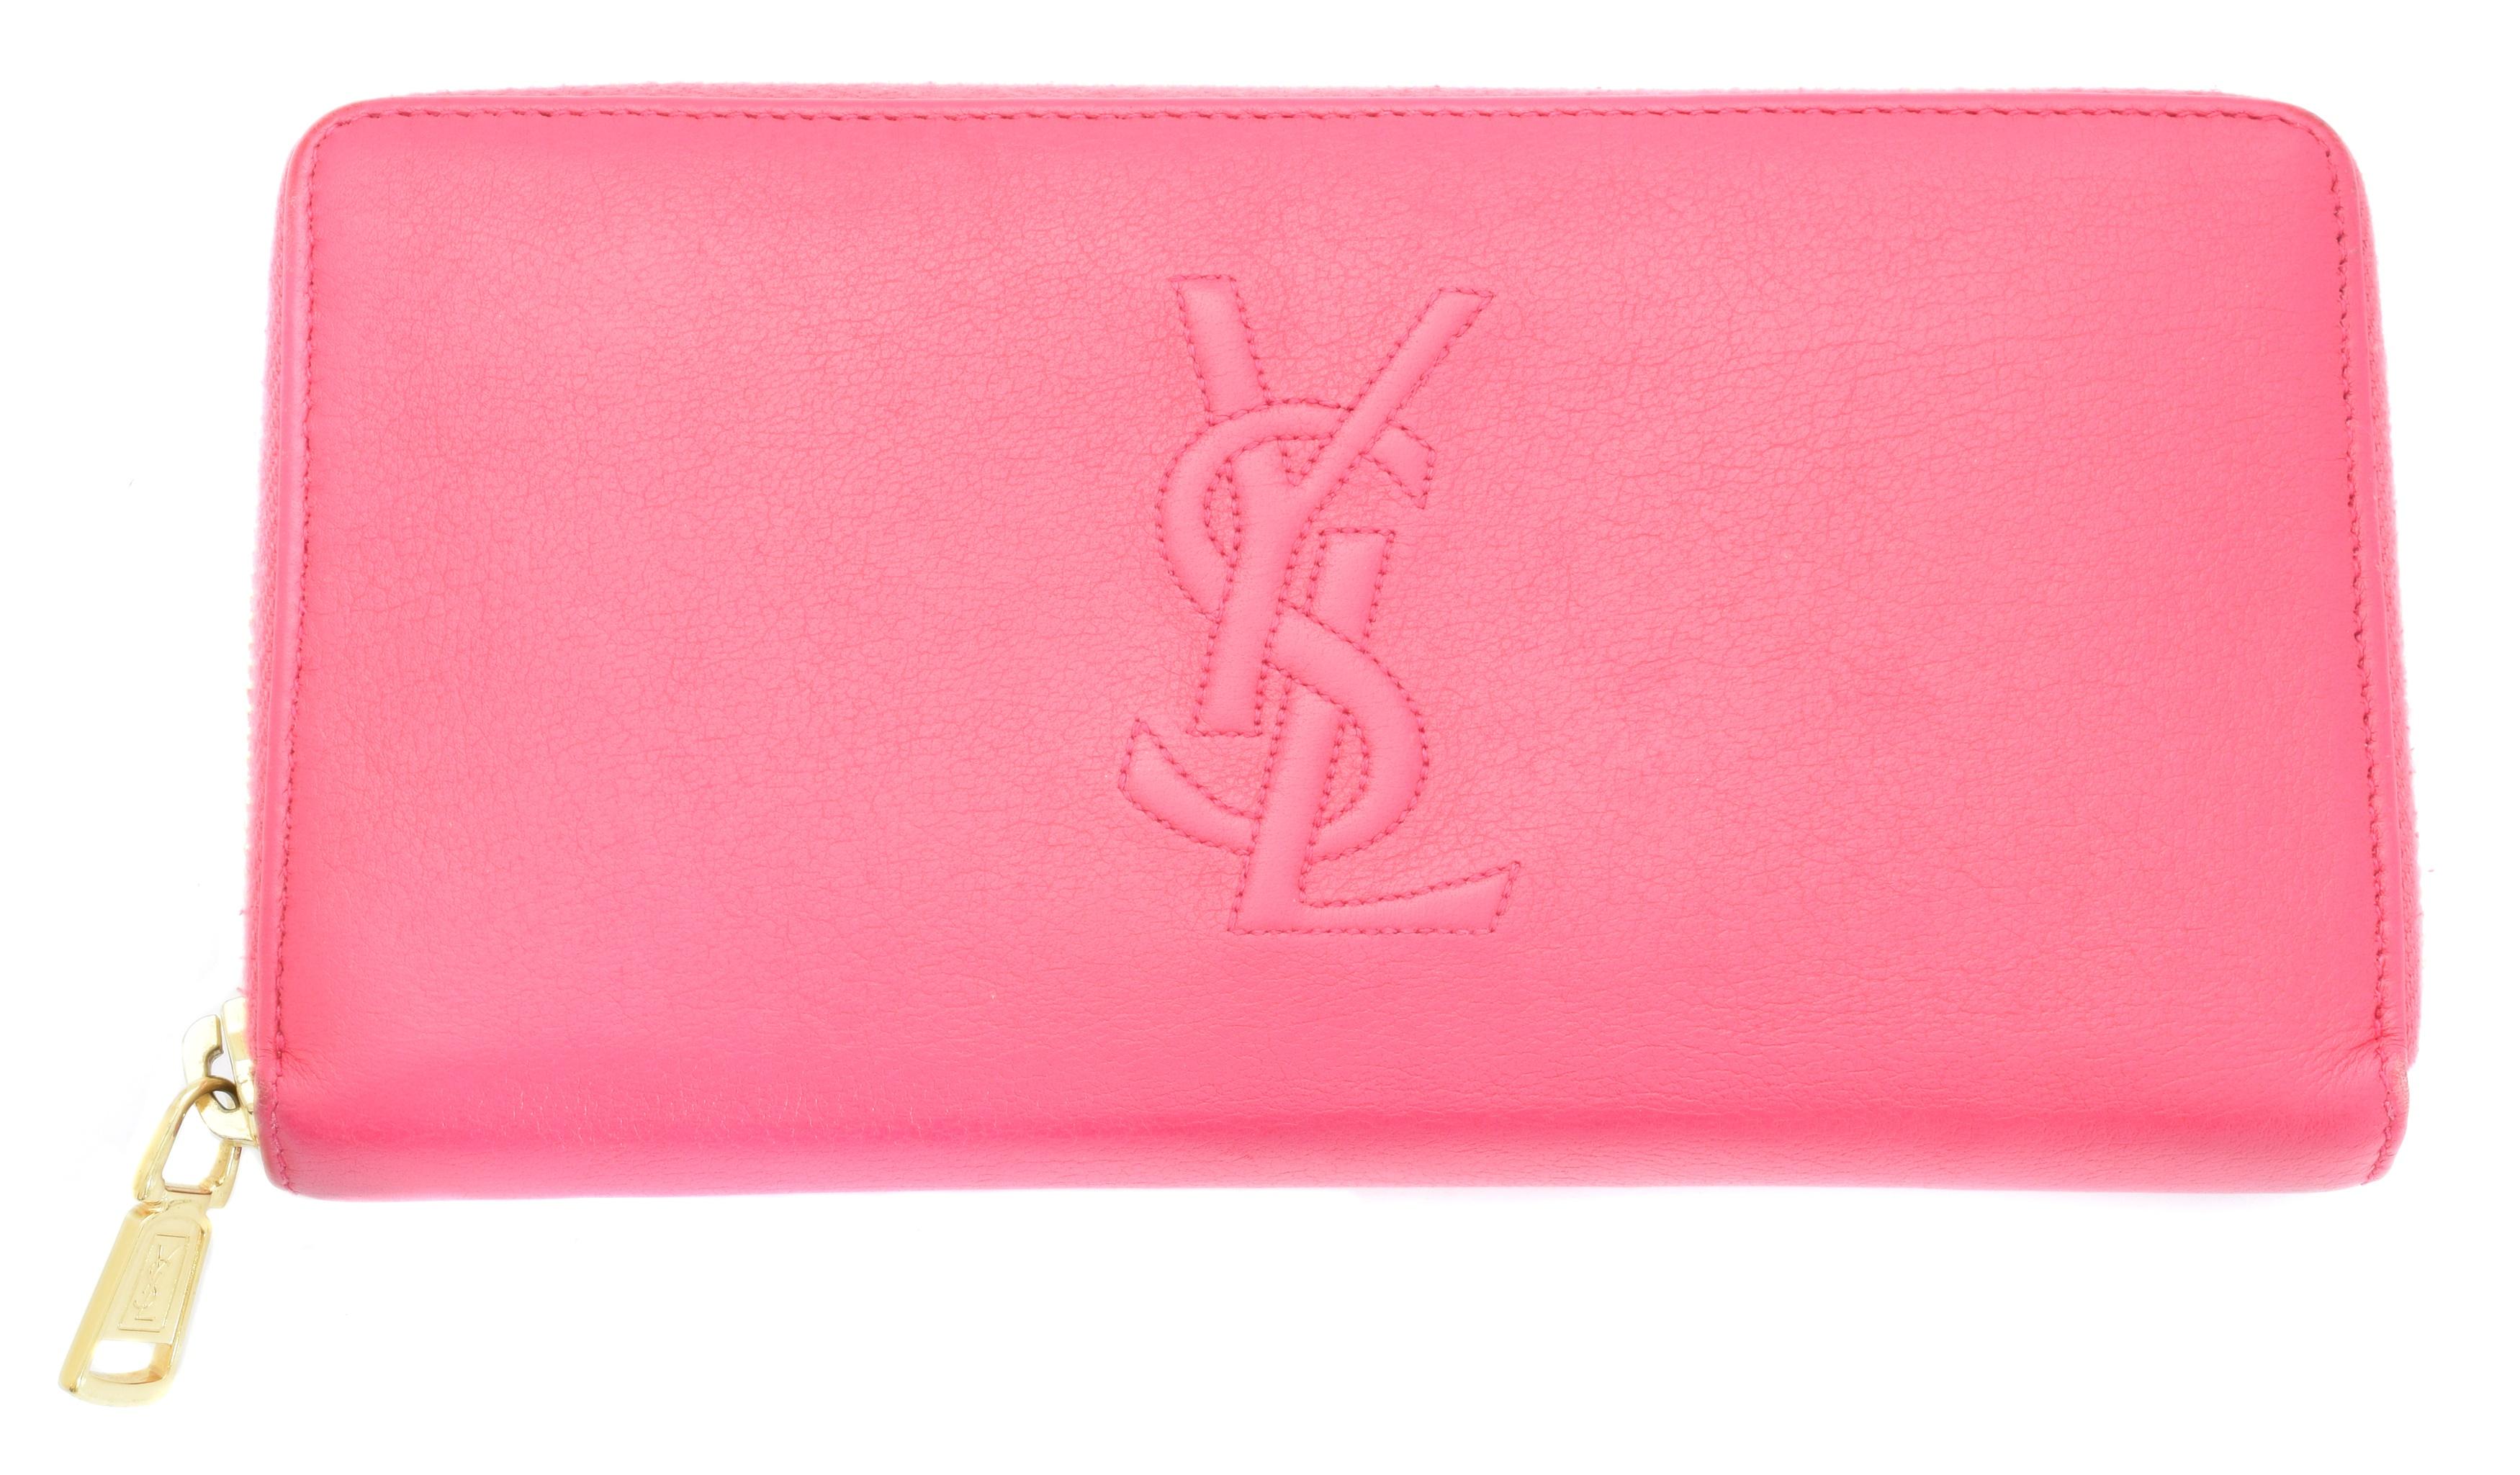 A Yves Saint Laurent zip around logo wallet,